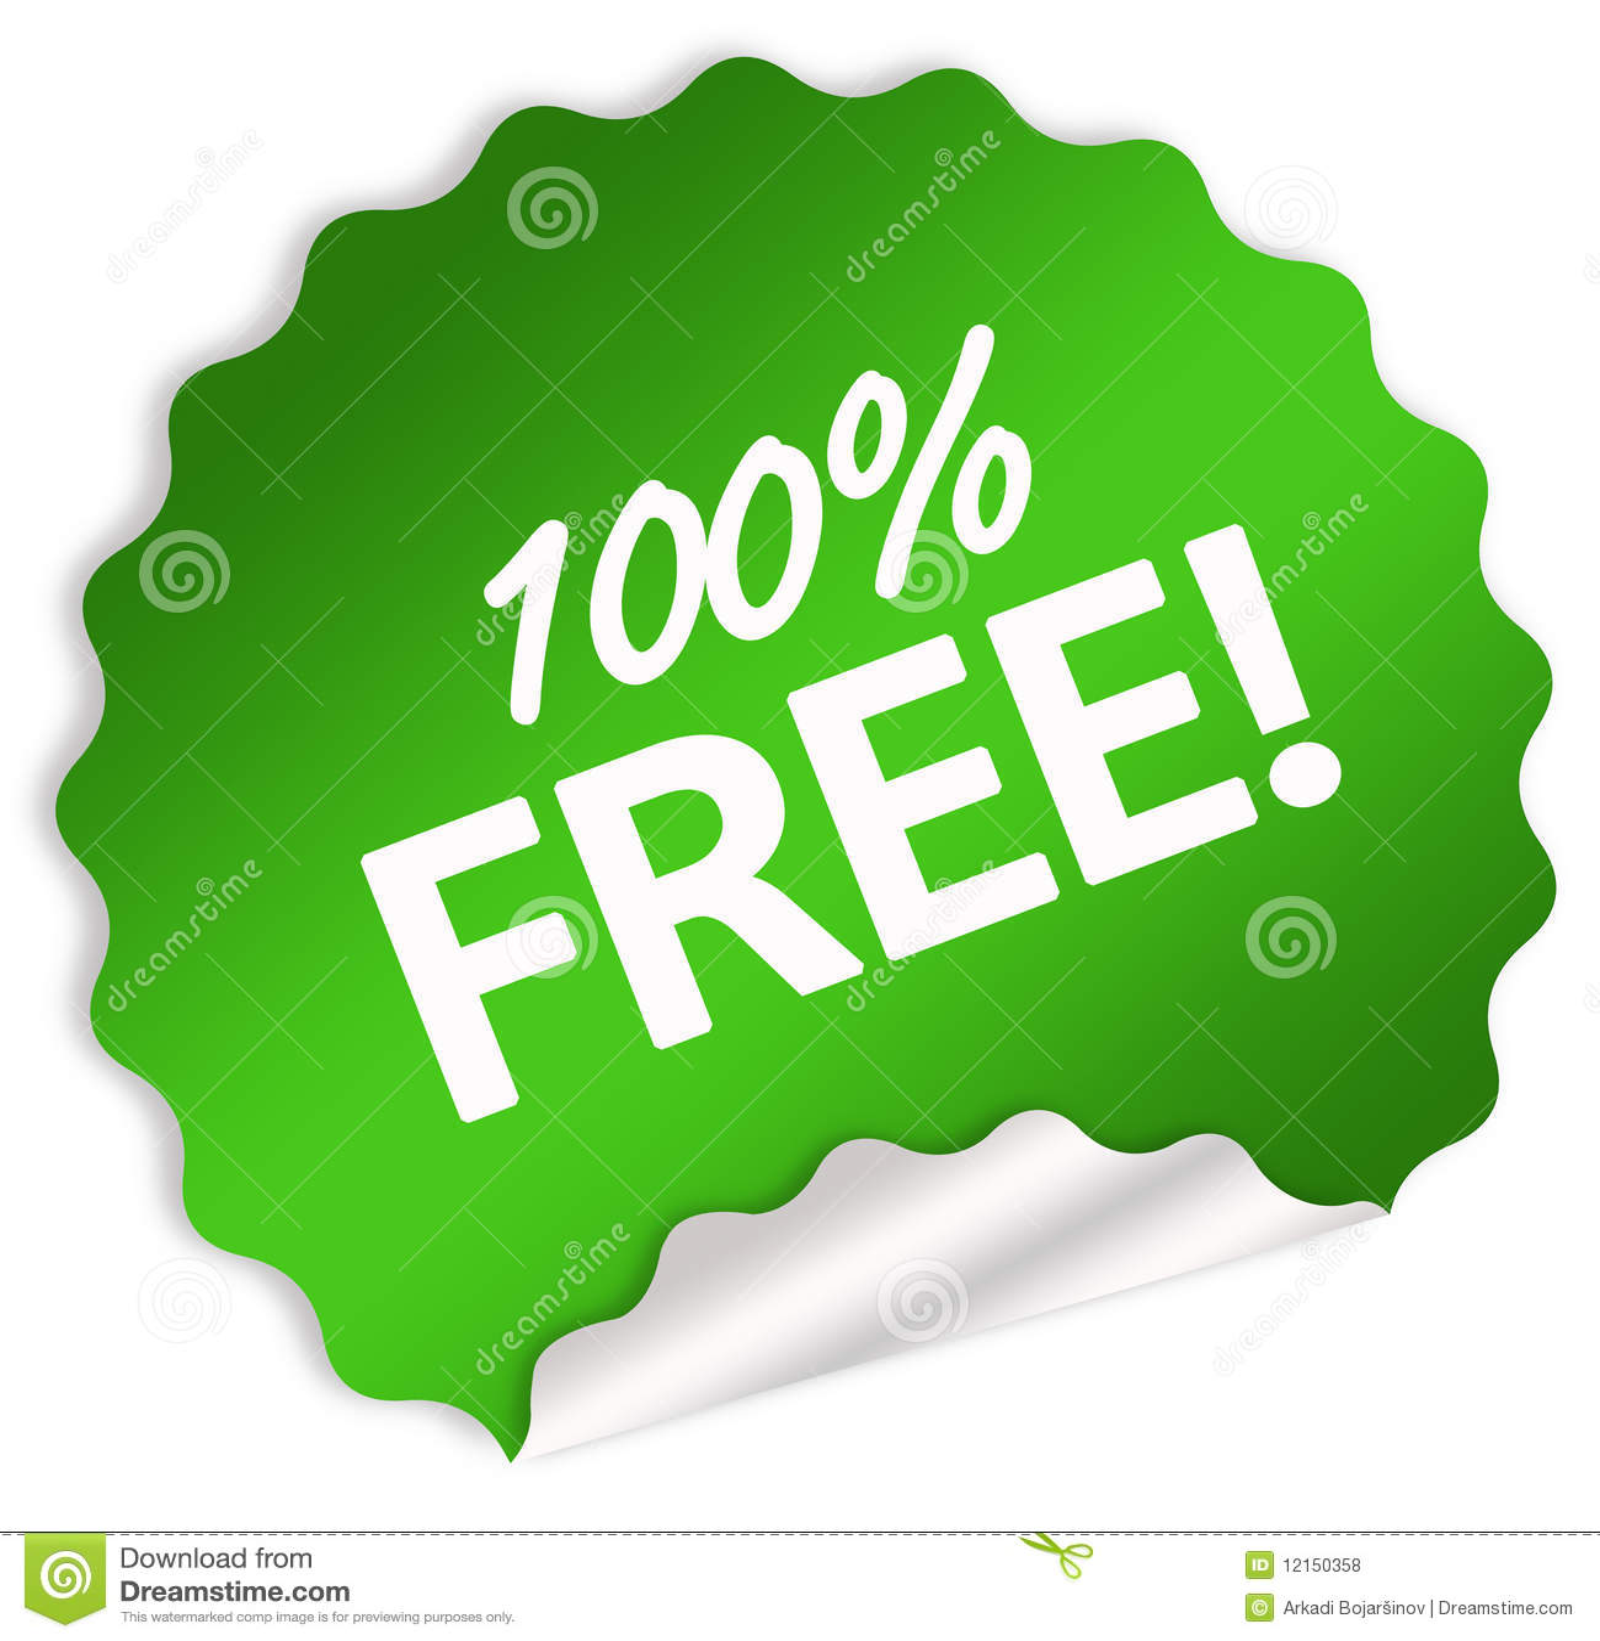 100 free sticker stock illustration illustration of percent 12150358